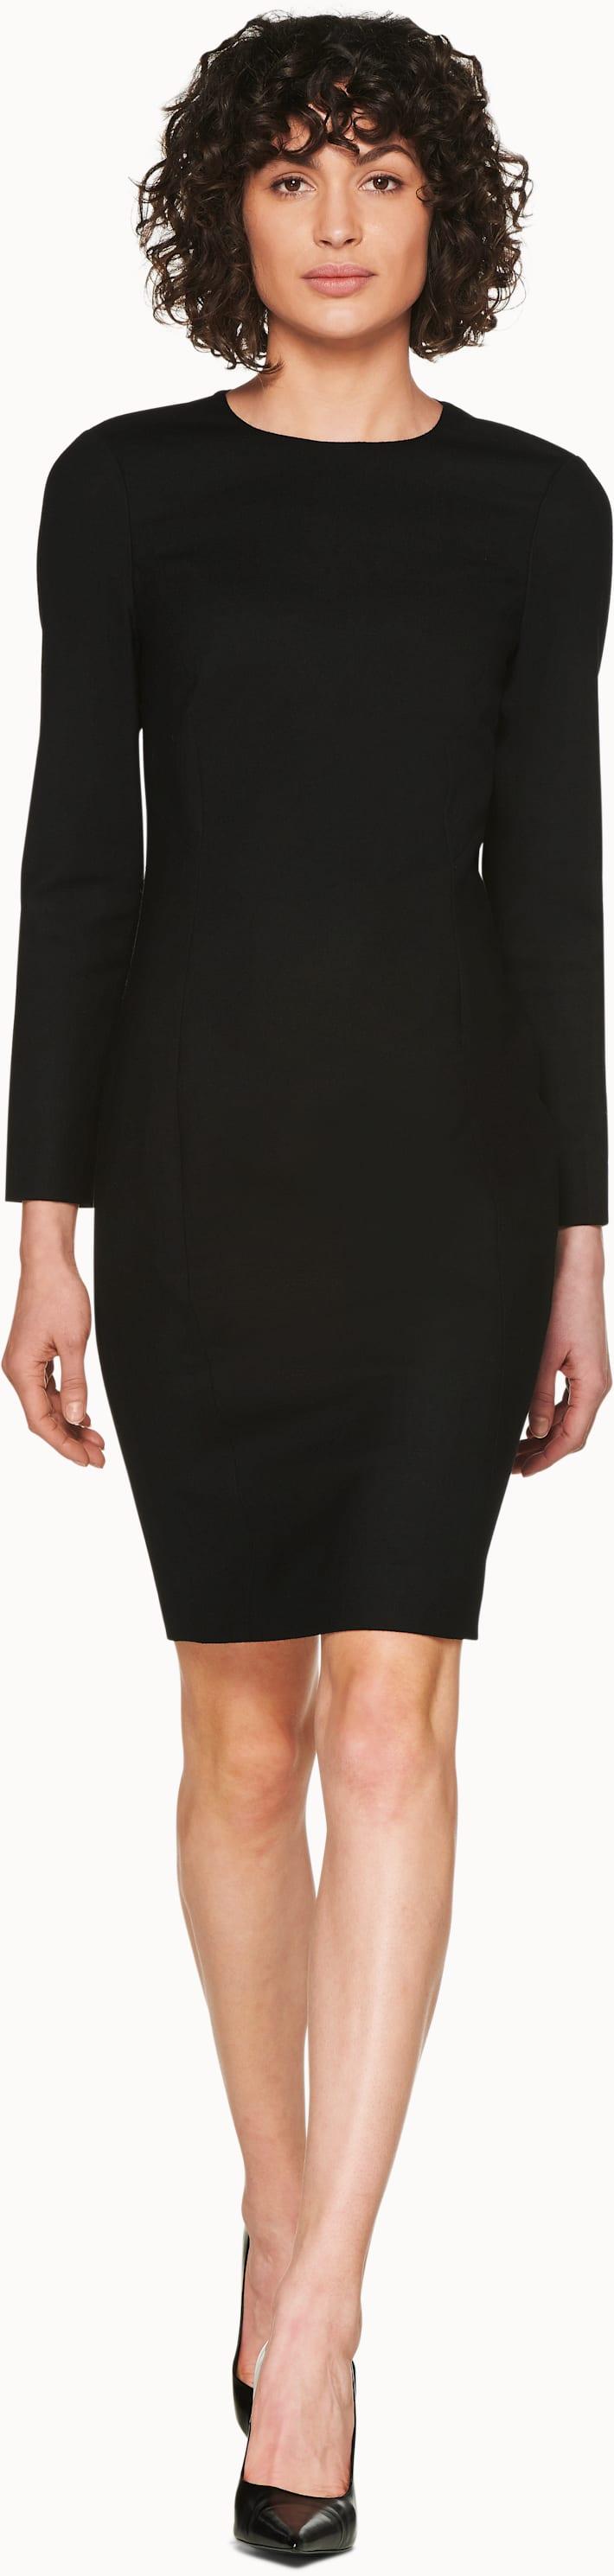 Carly Black  Dress